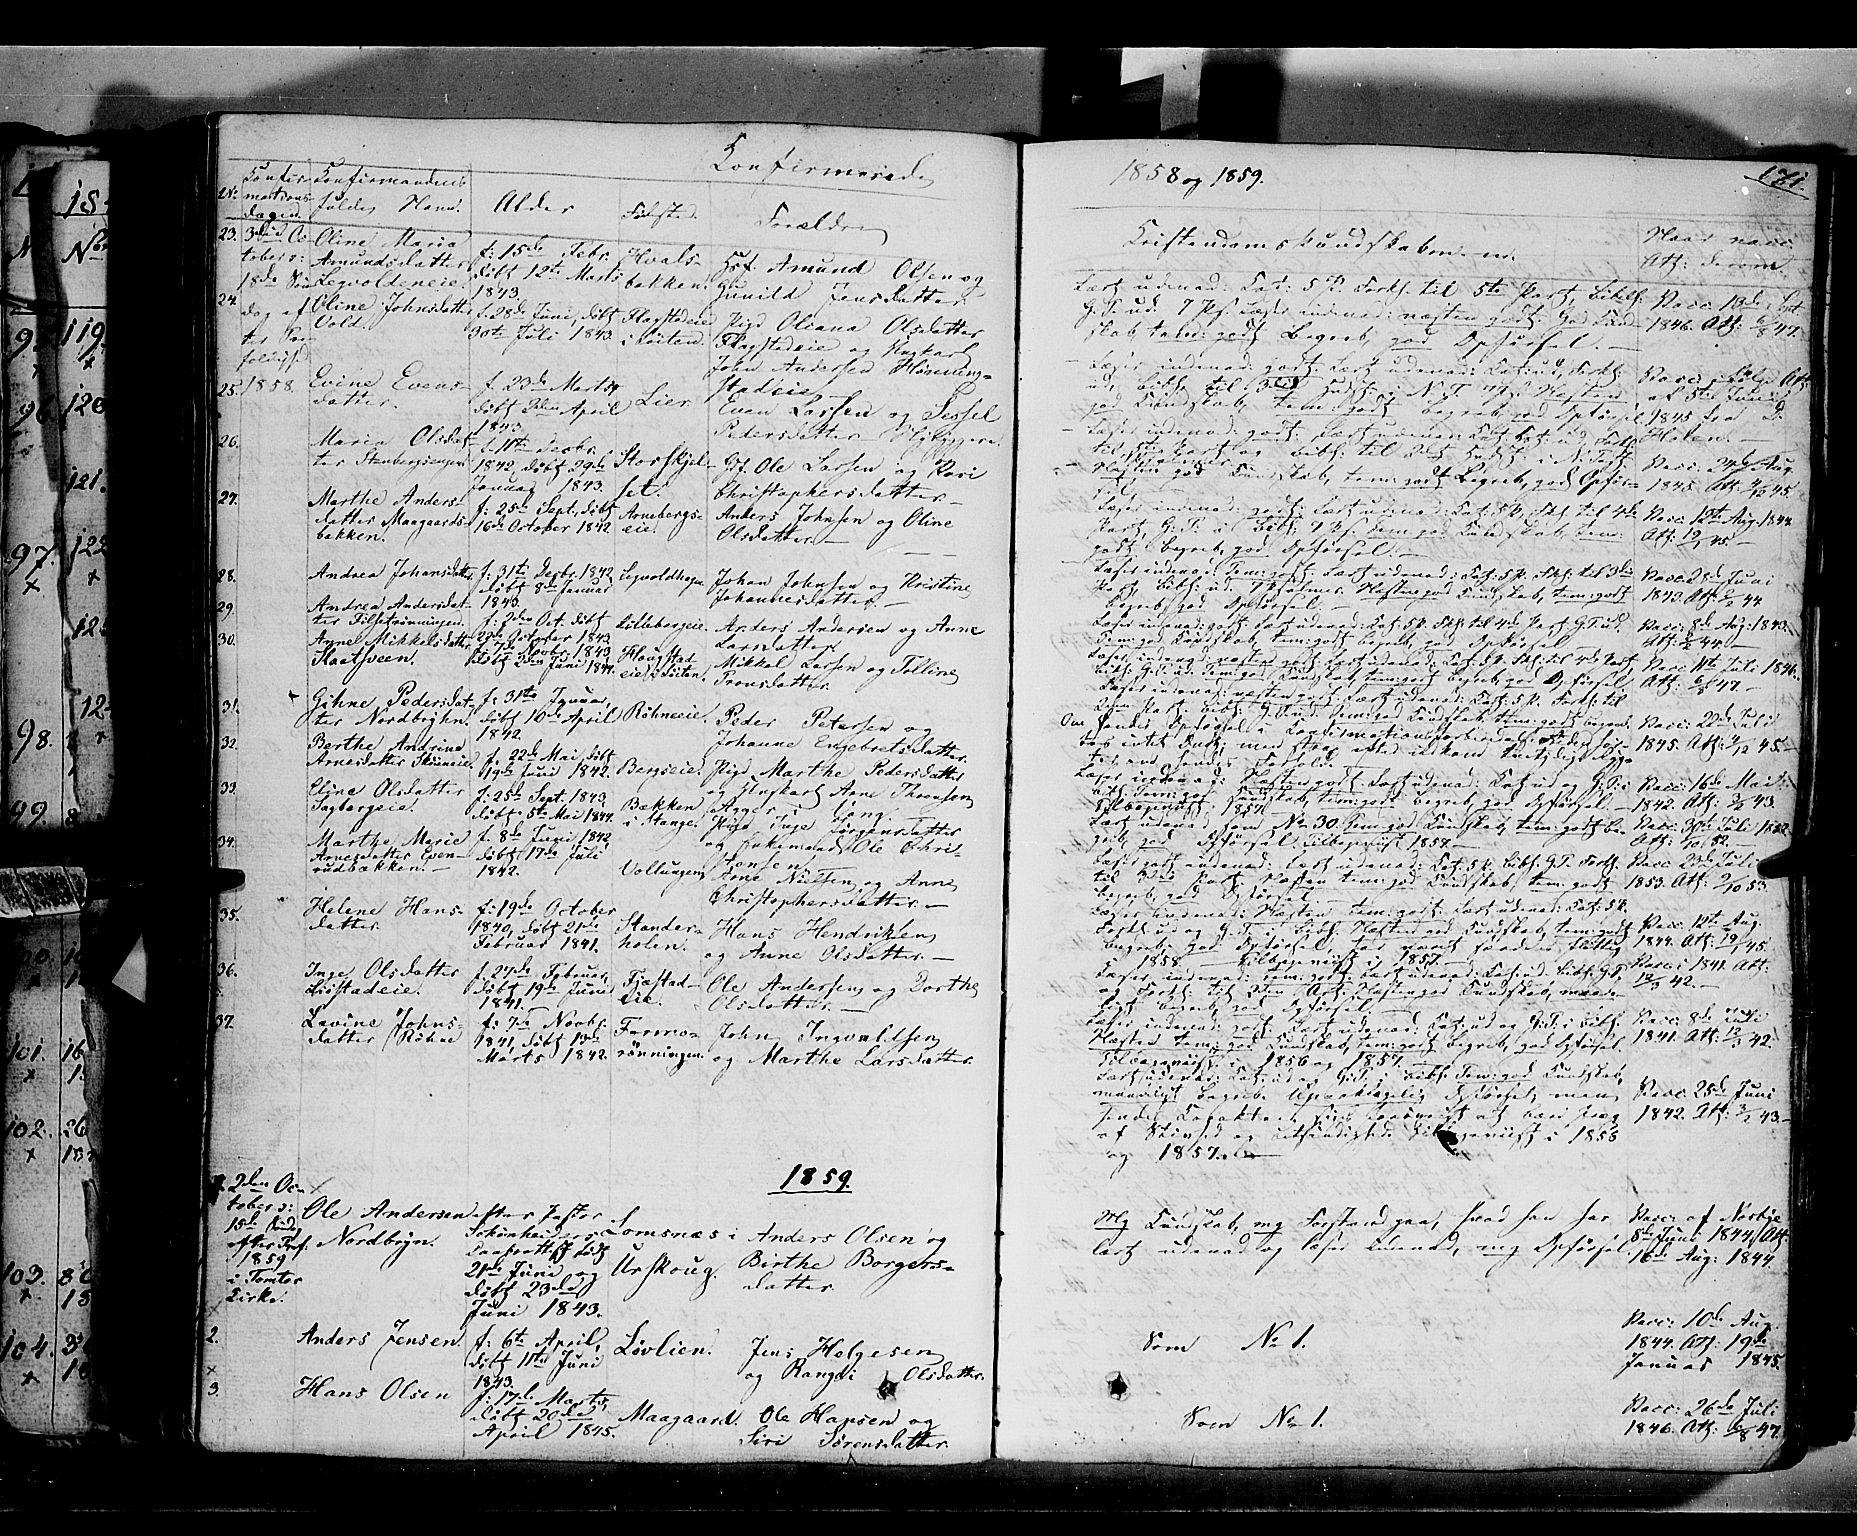 SAH, Romedal prestekontor, K/L0004: Ministerialbok nr. 4, 1847-1861, s. 171